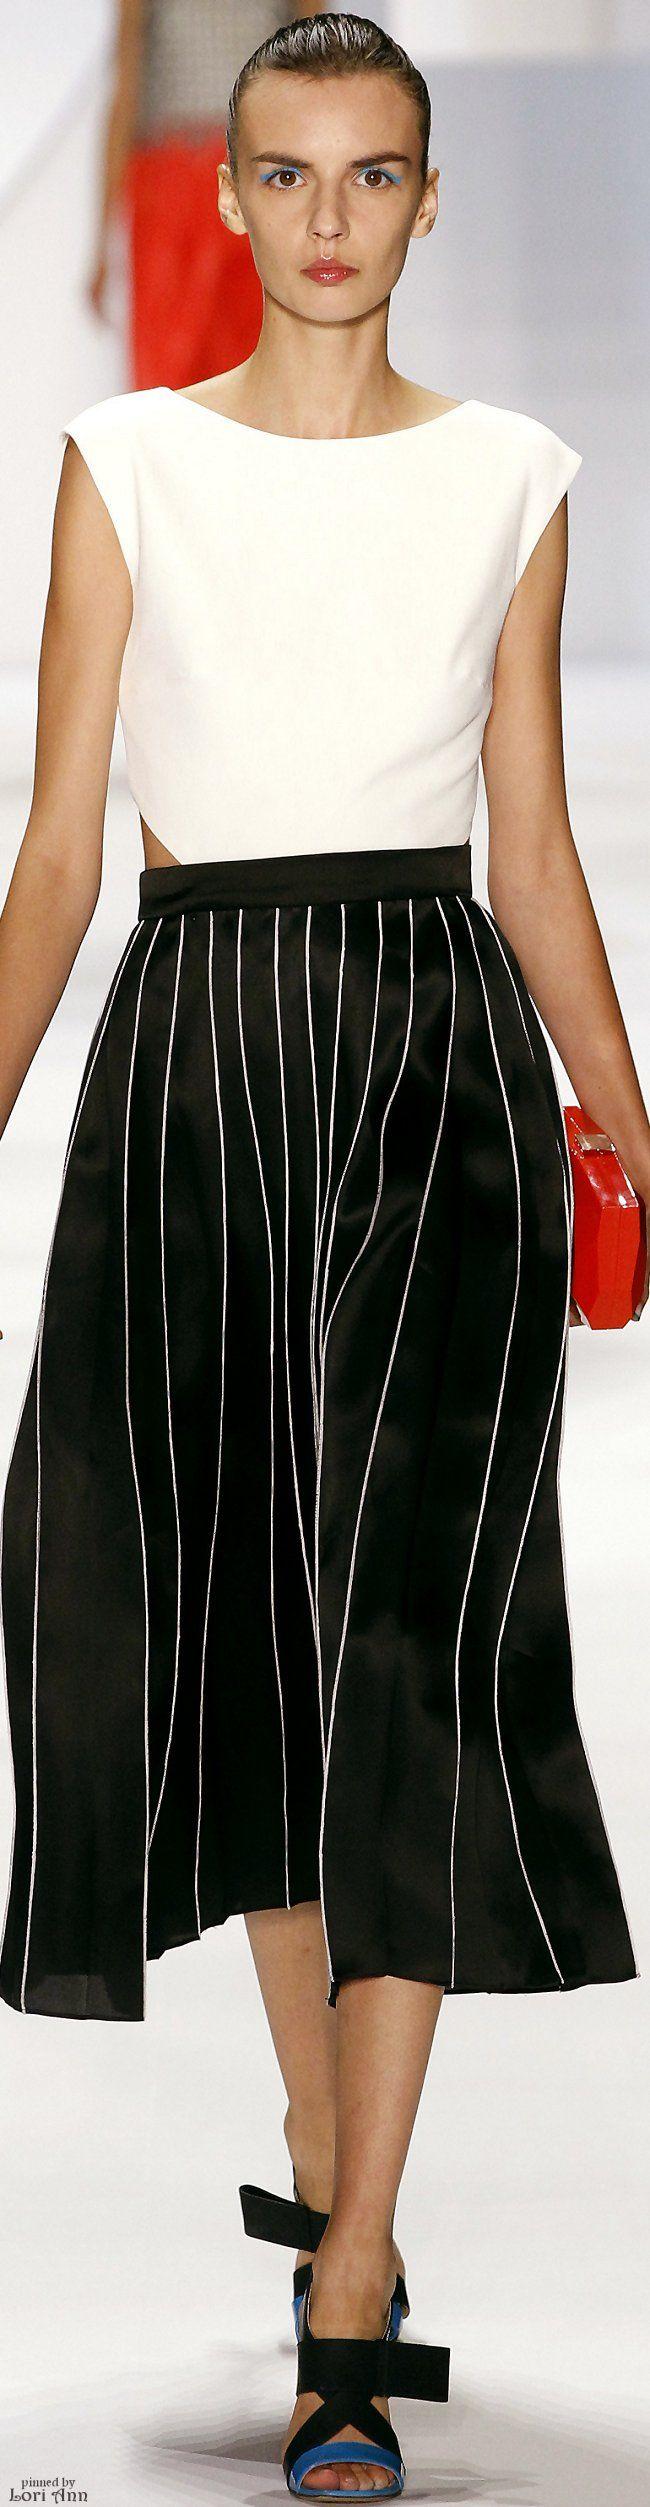 Monique Lhuillier Spring 2016 Rtw Perfect Sleek Ponytail